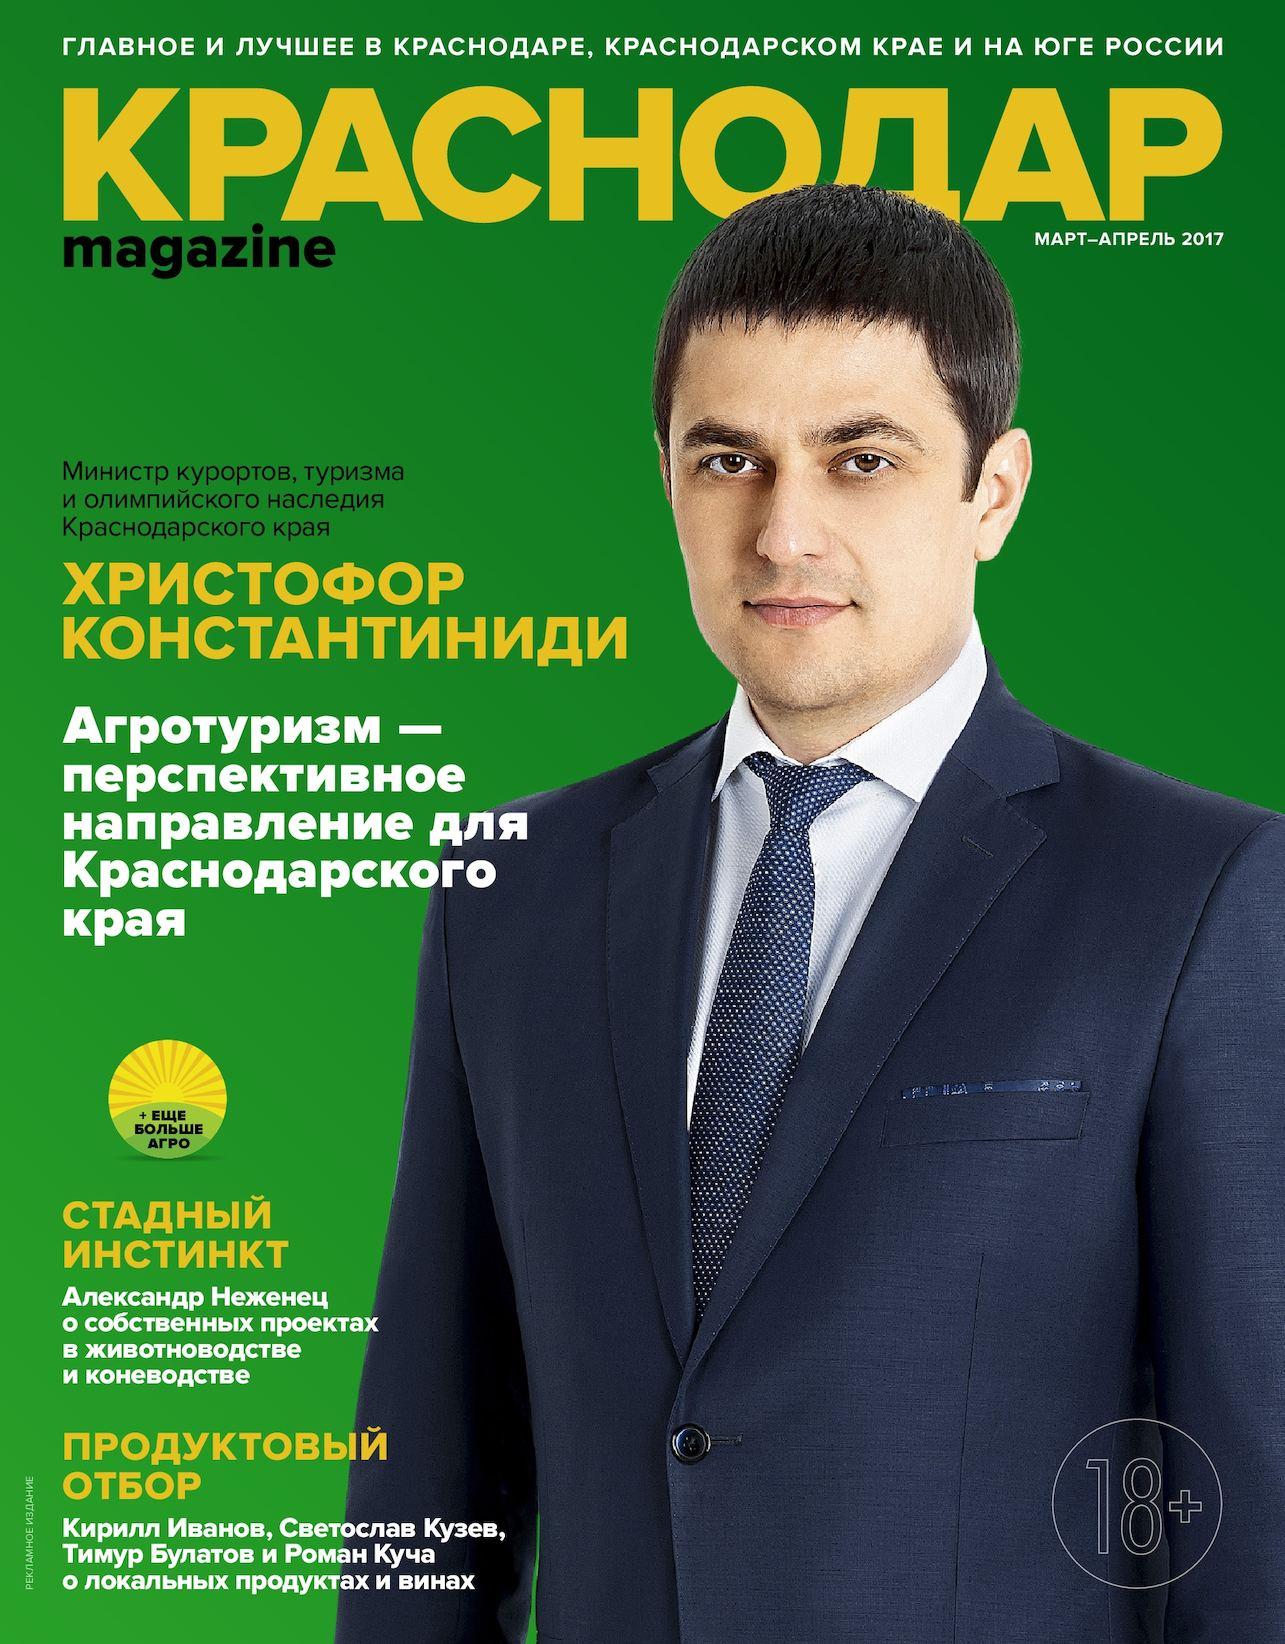 ac5838edf4c3 Calaméo - Krasnodar Magazine Март-апрель 2017